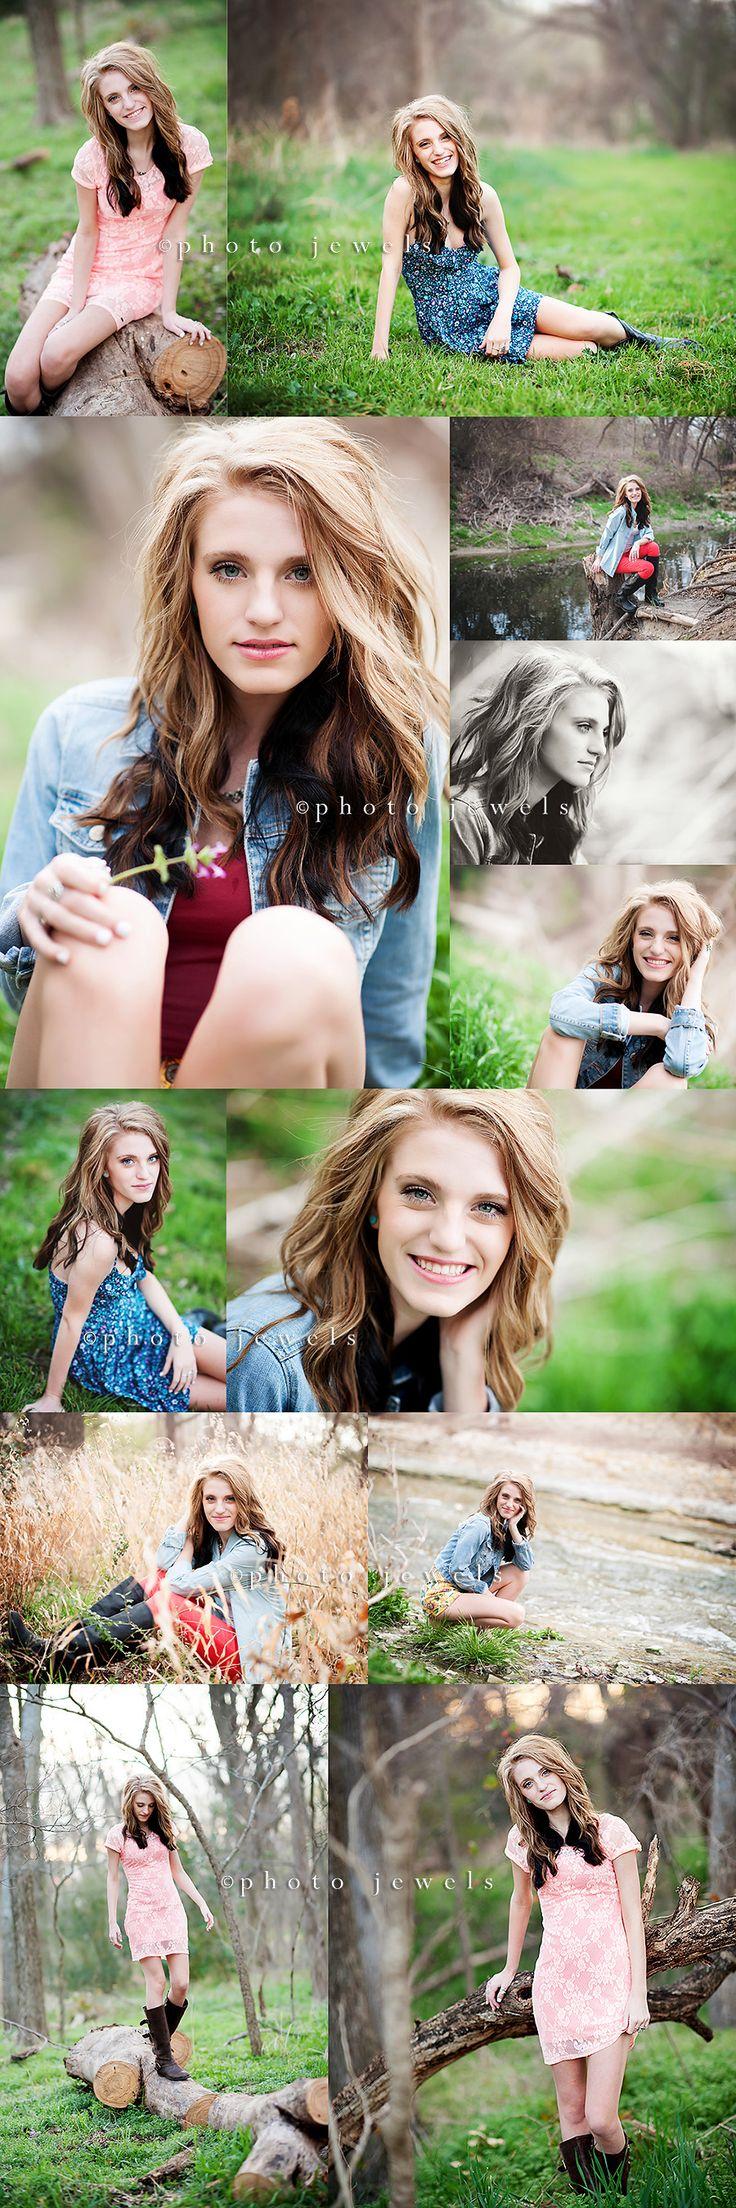 senior portraits by photo jewels rockwall, senior girl, senior girl pics, senior portraits, senior photography, senior girl photos, senior photo ideas, senior pic ideas